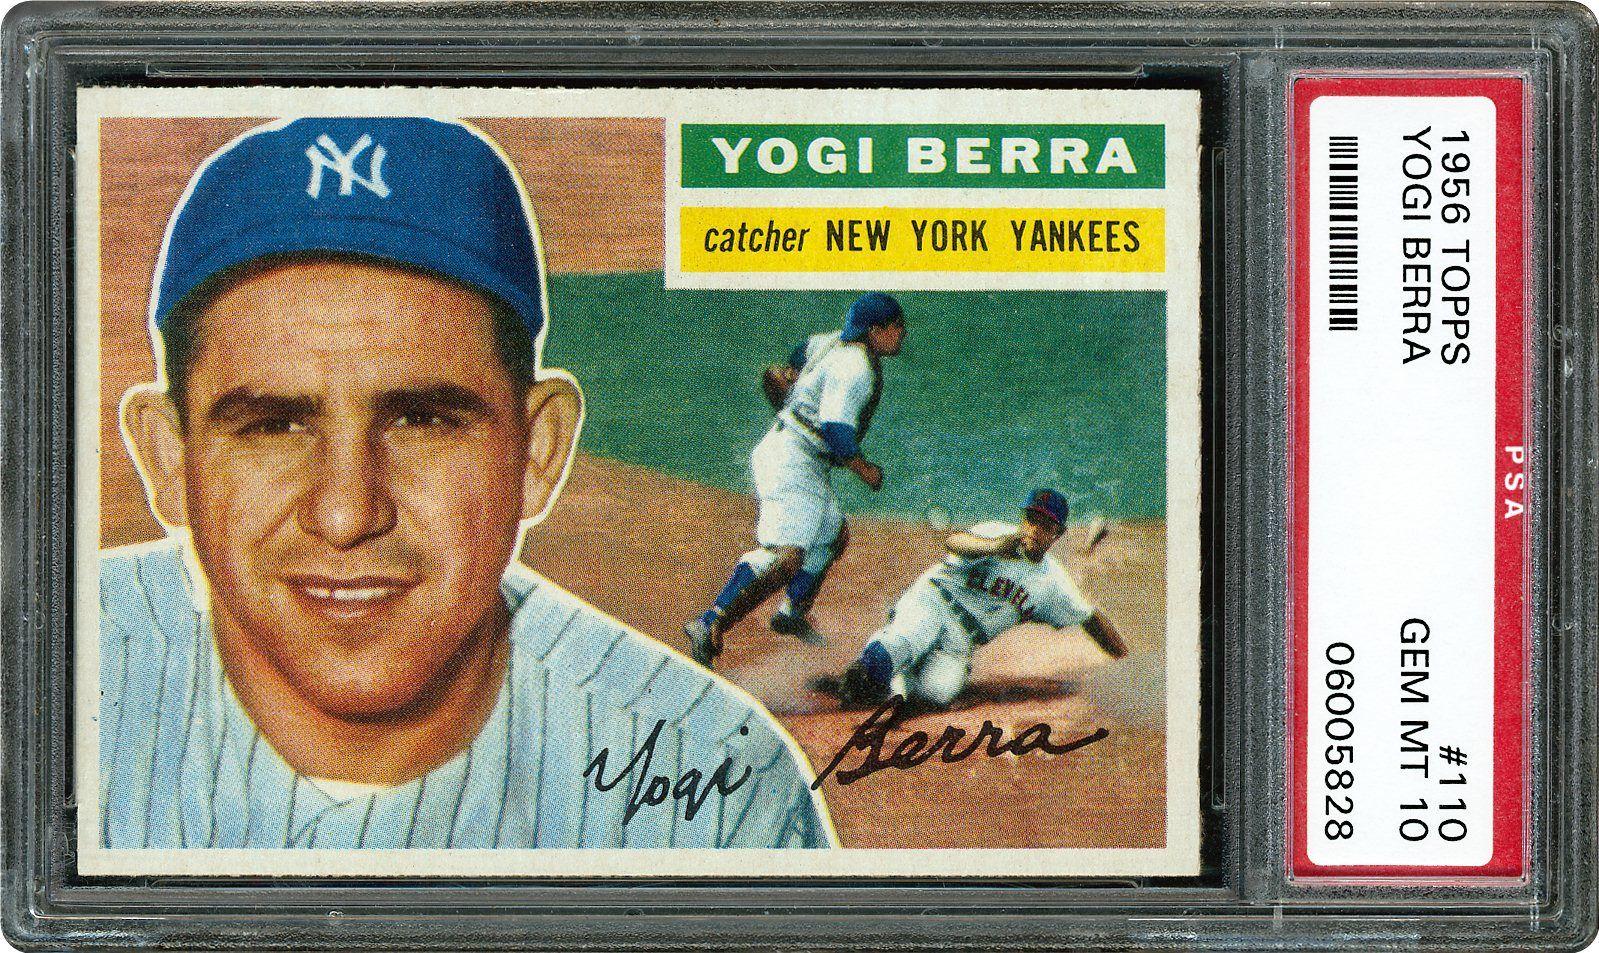 1956 Topps Yogi Berra Psa Cardfacts